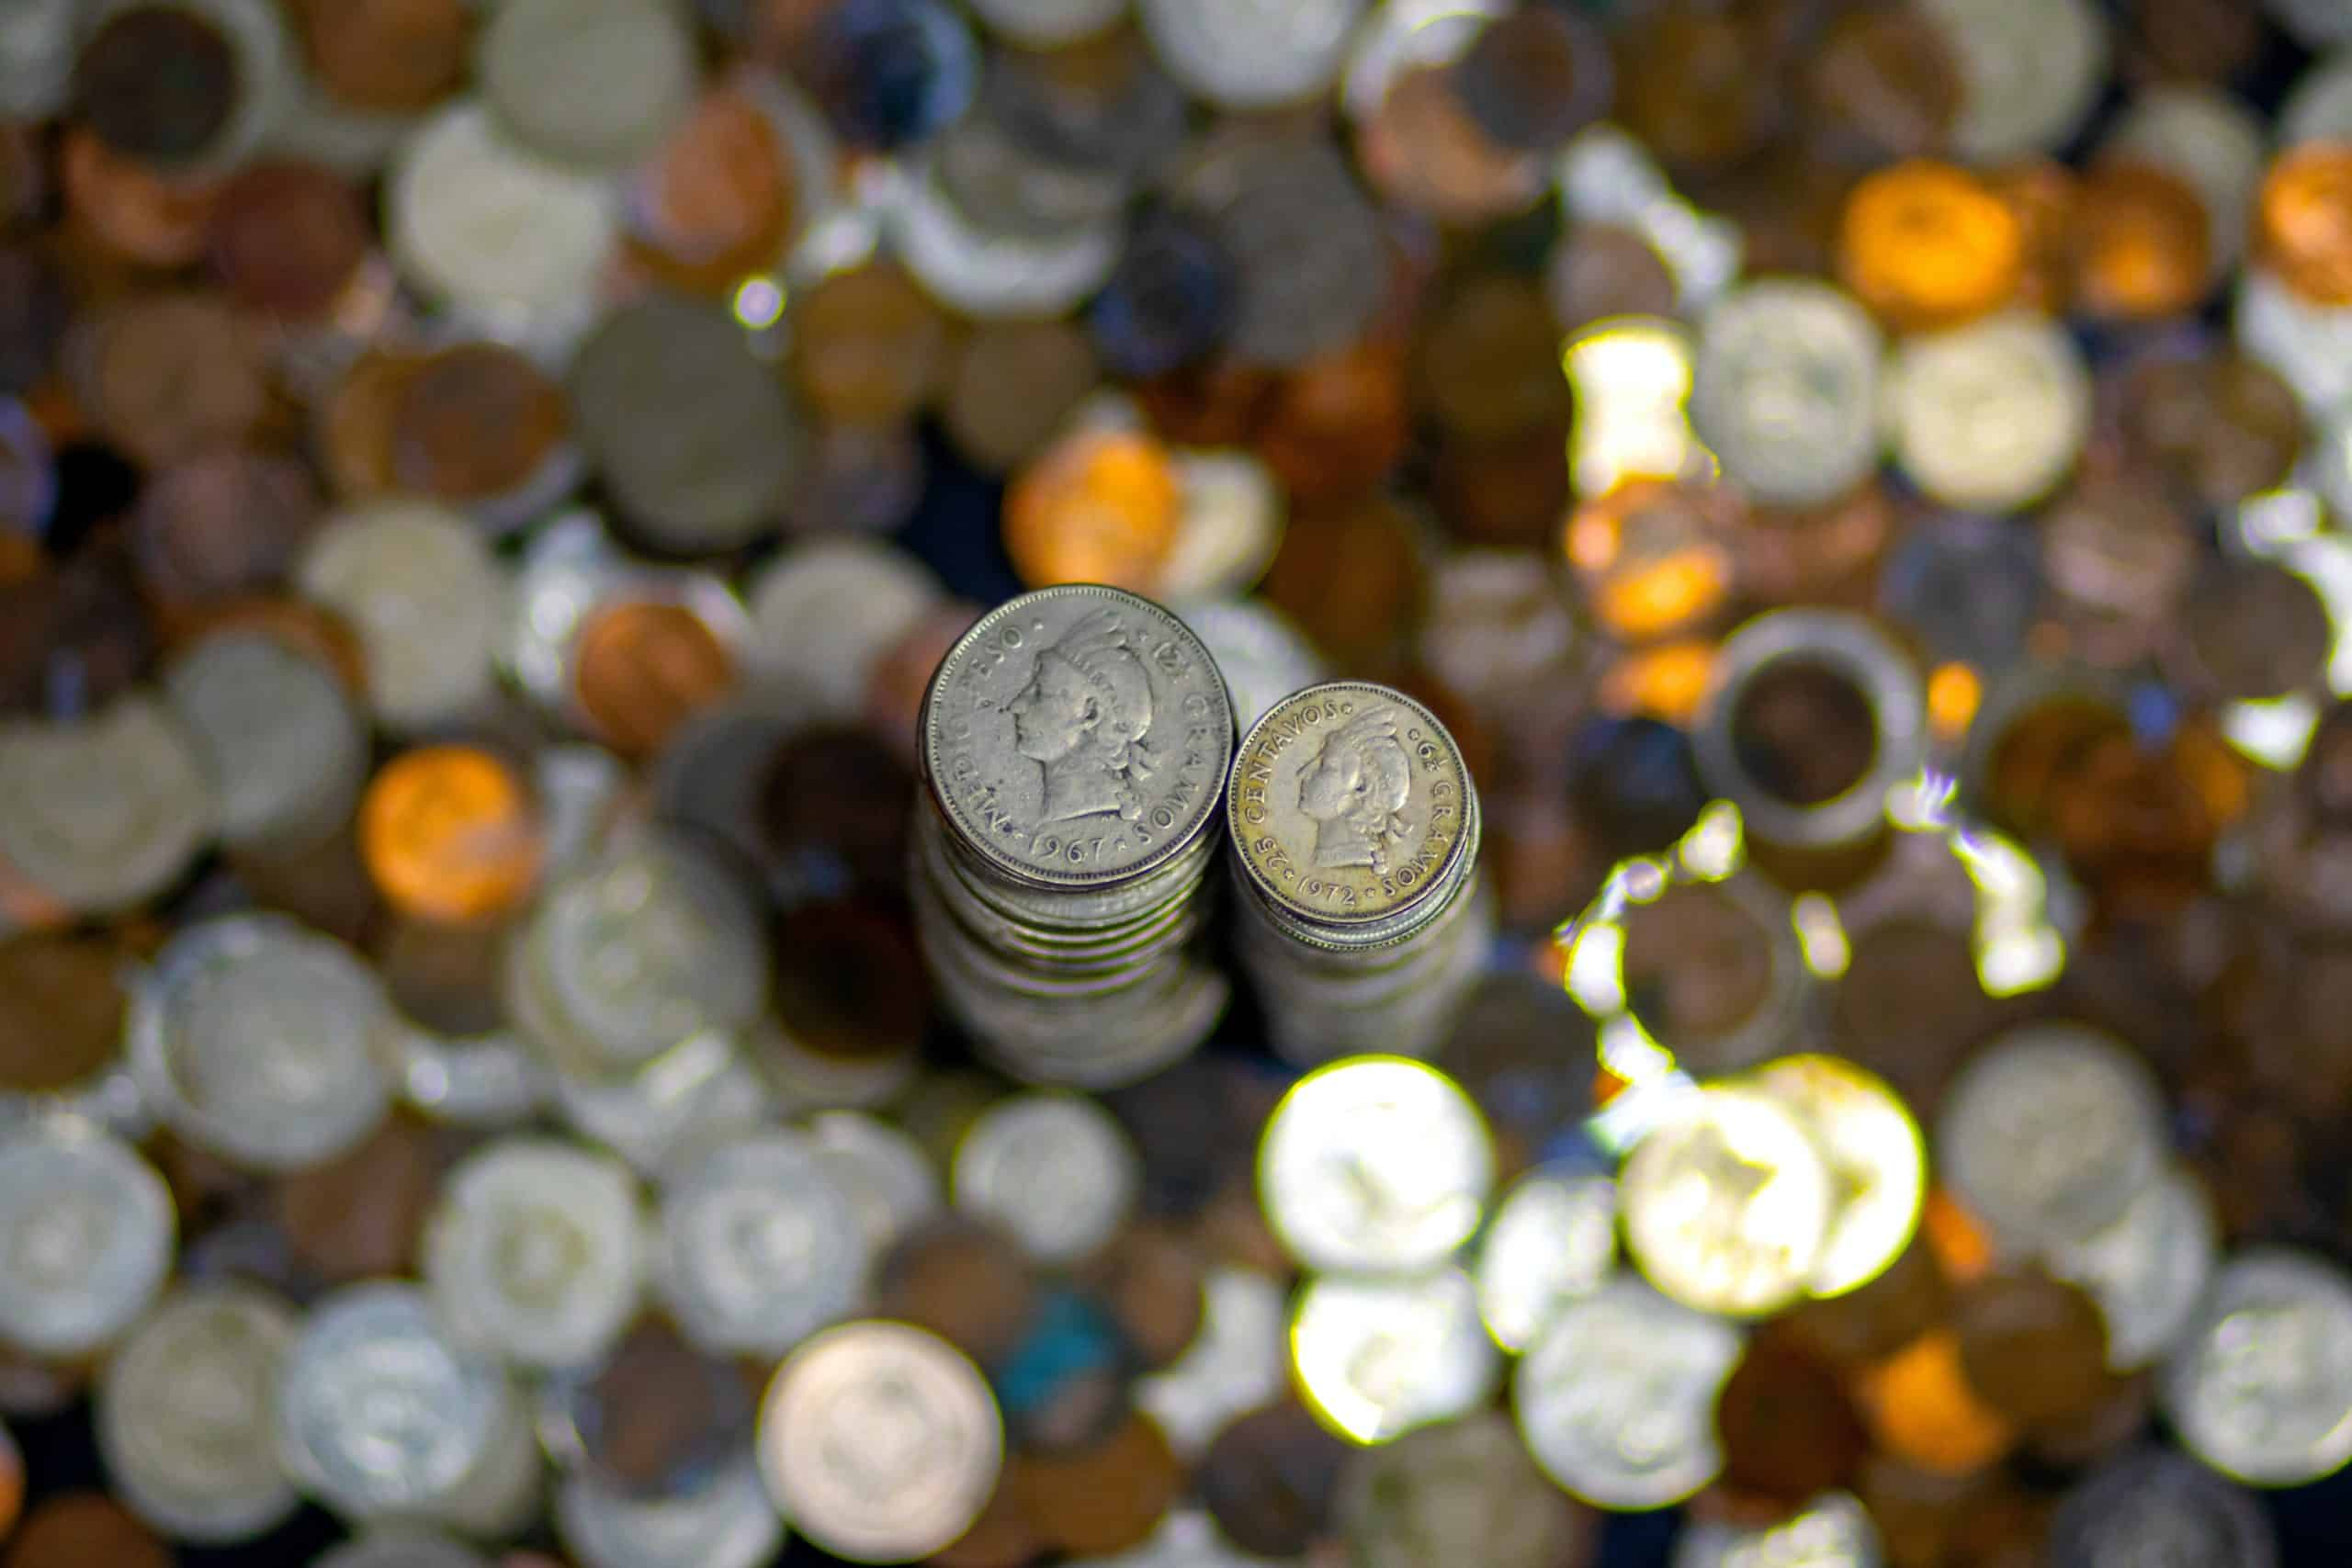 Best Anti-Money Laundering course tutorial class certification training online